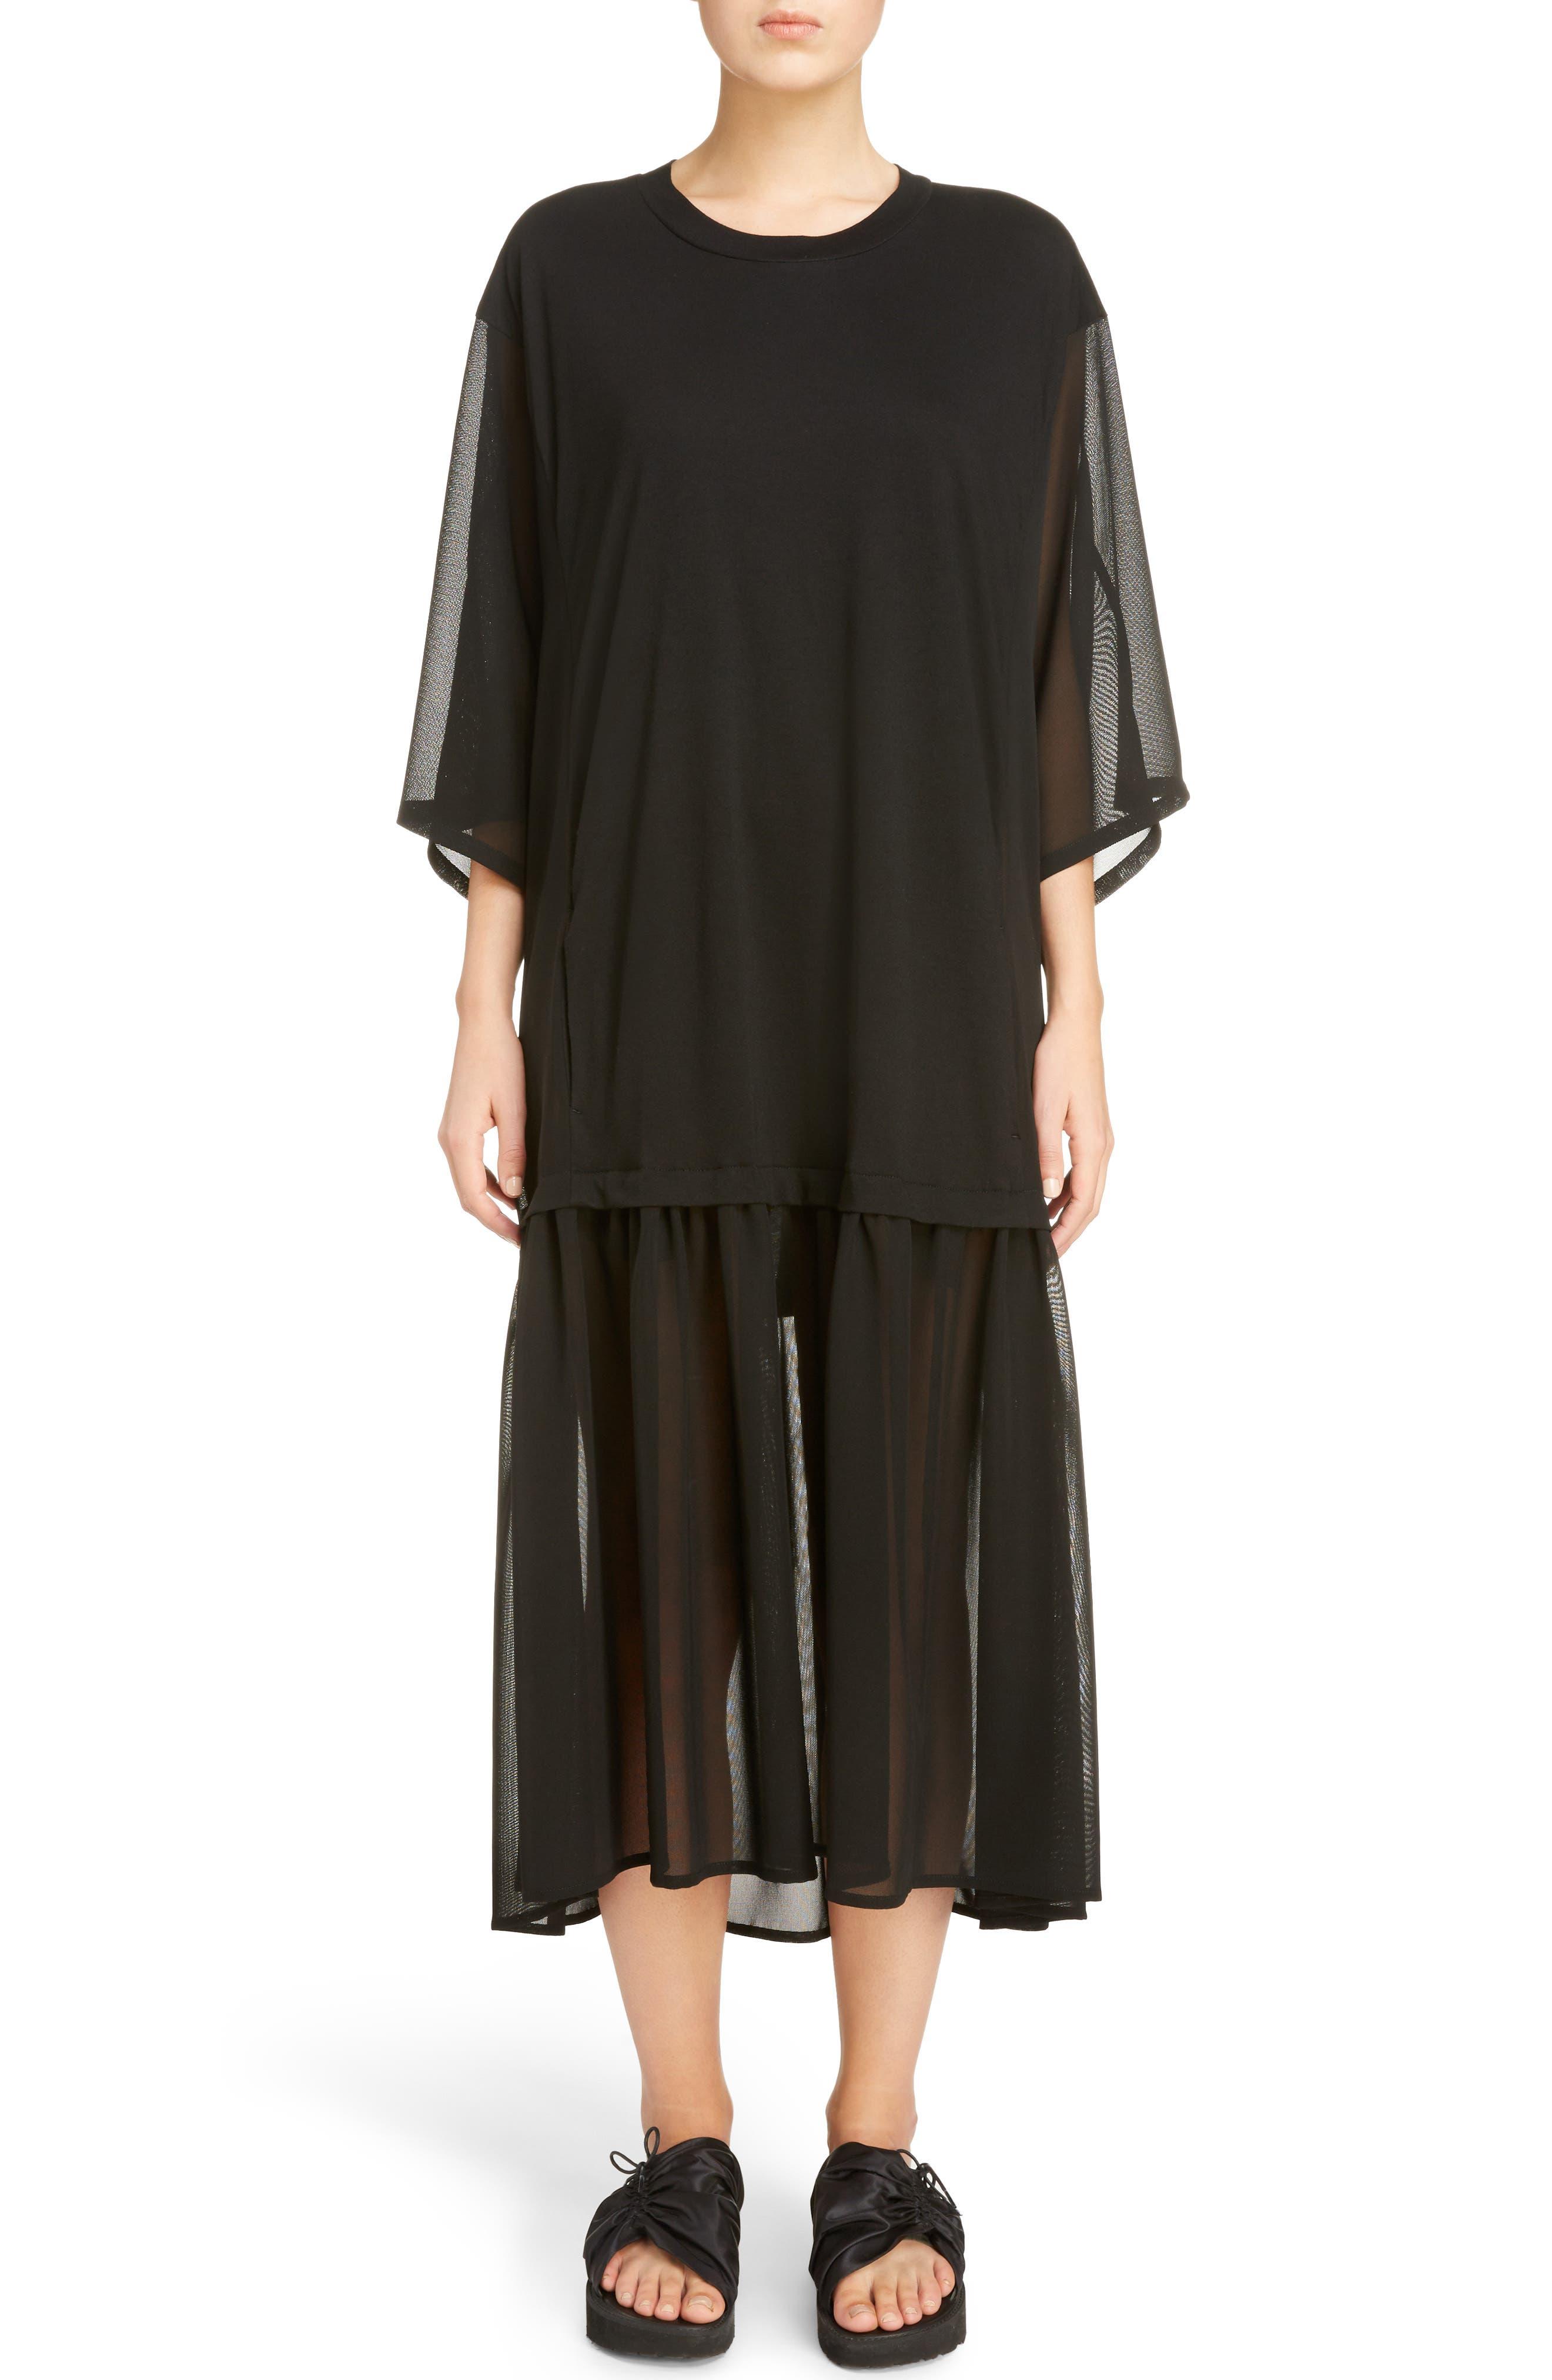 Y's by Yohji Yamamoto Sheer Hem T-Shirt Dress